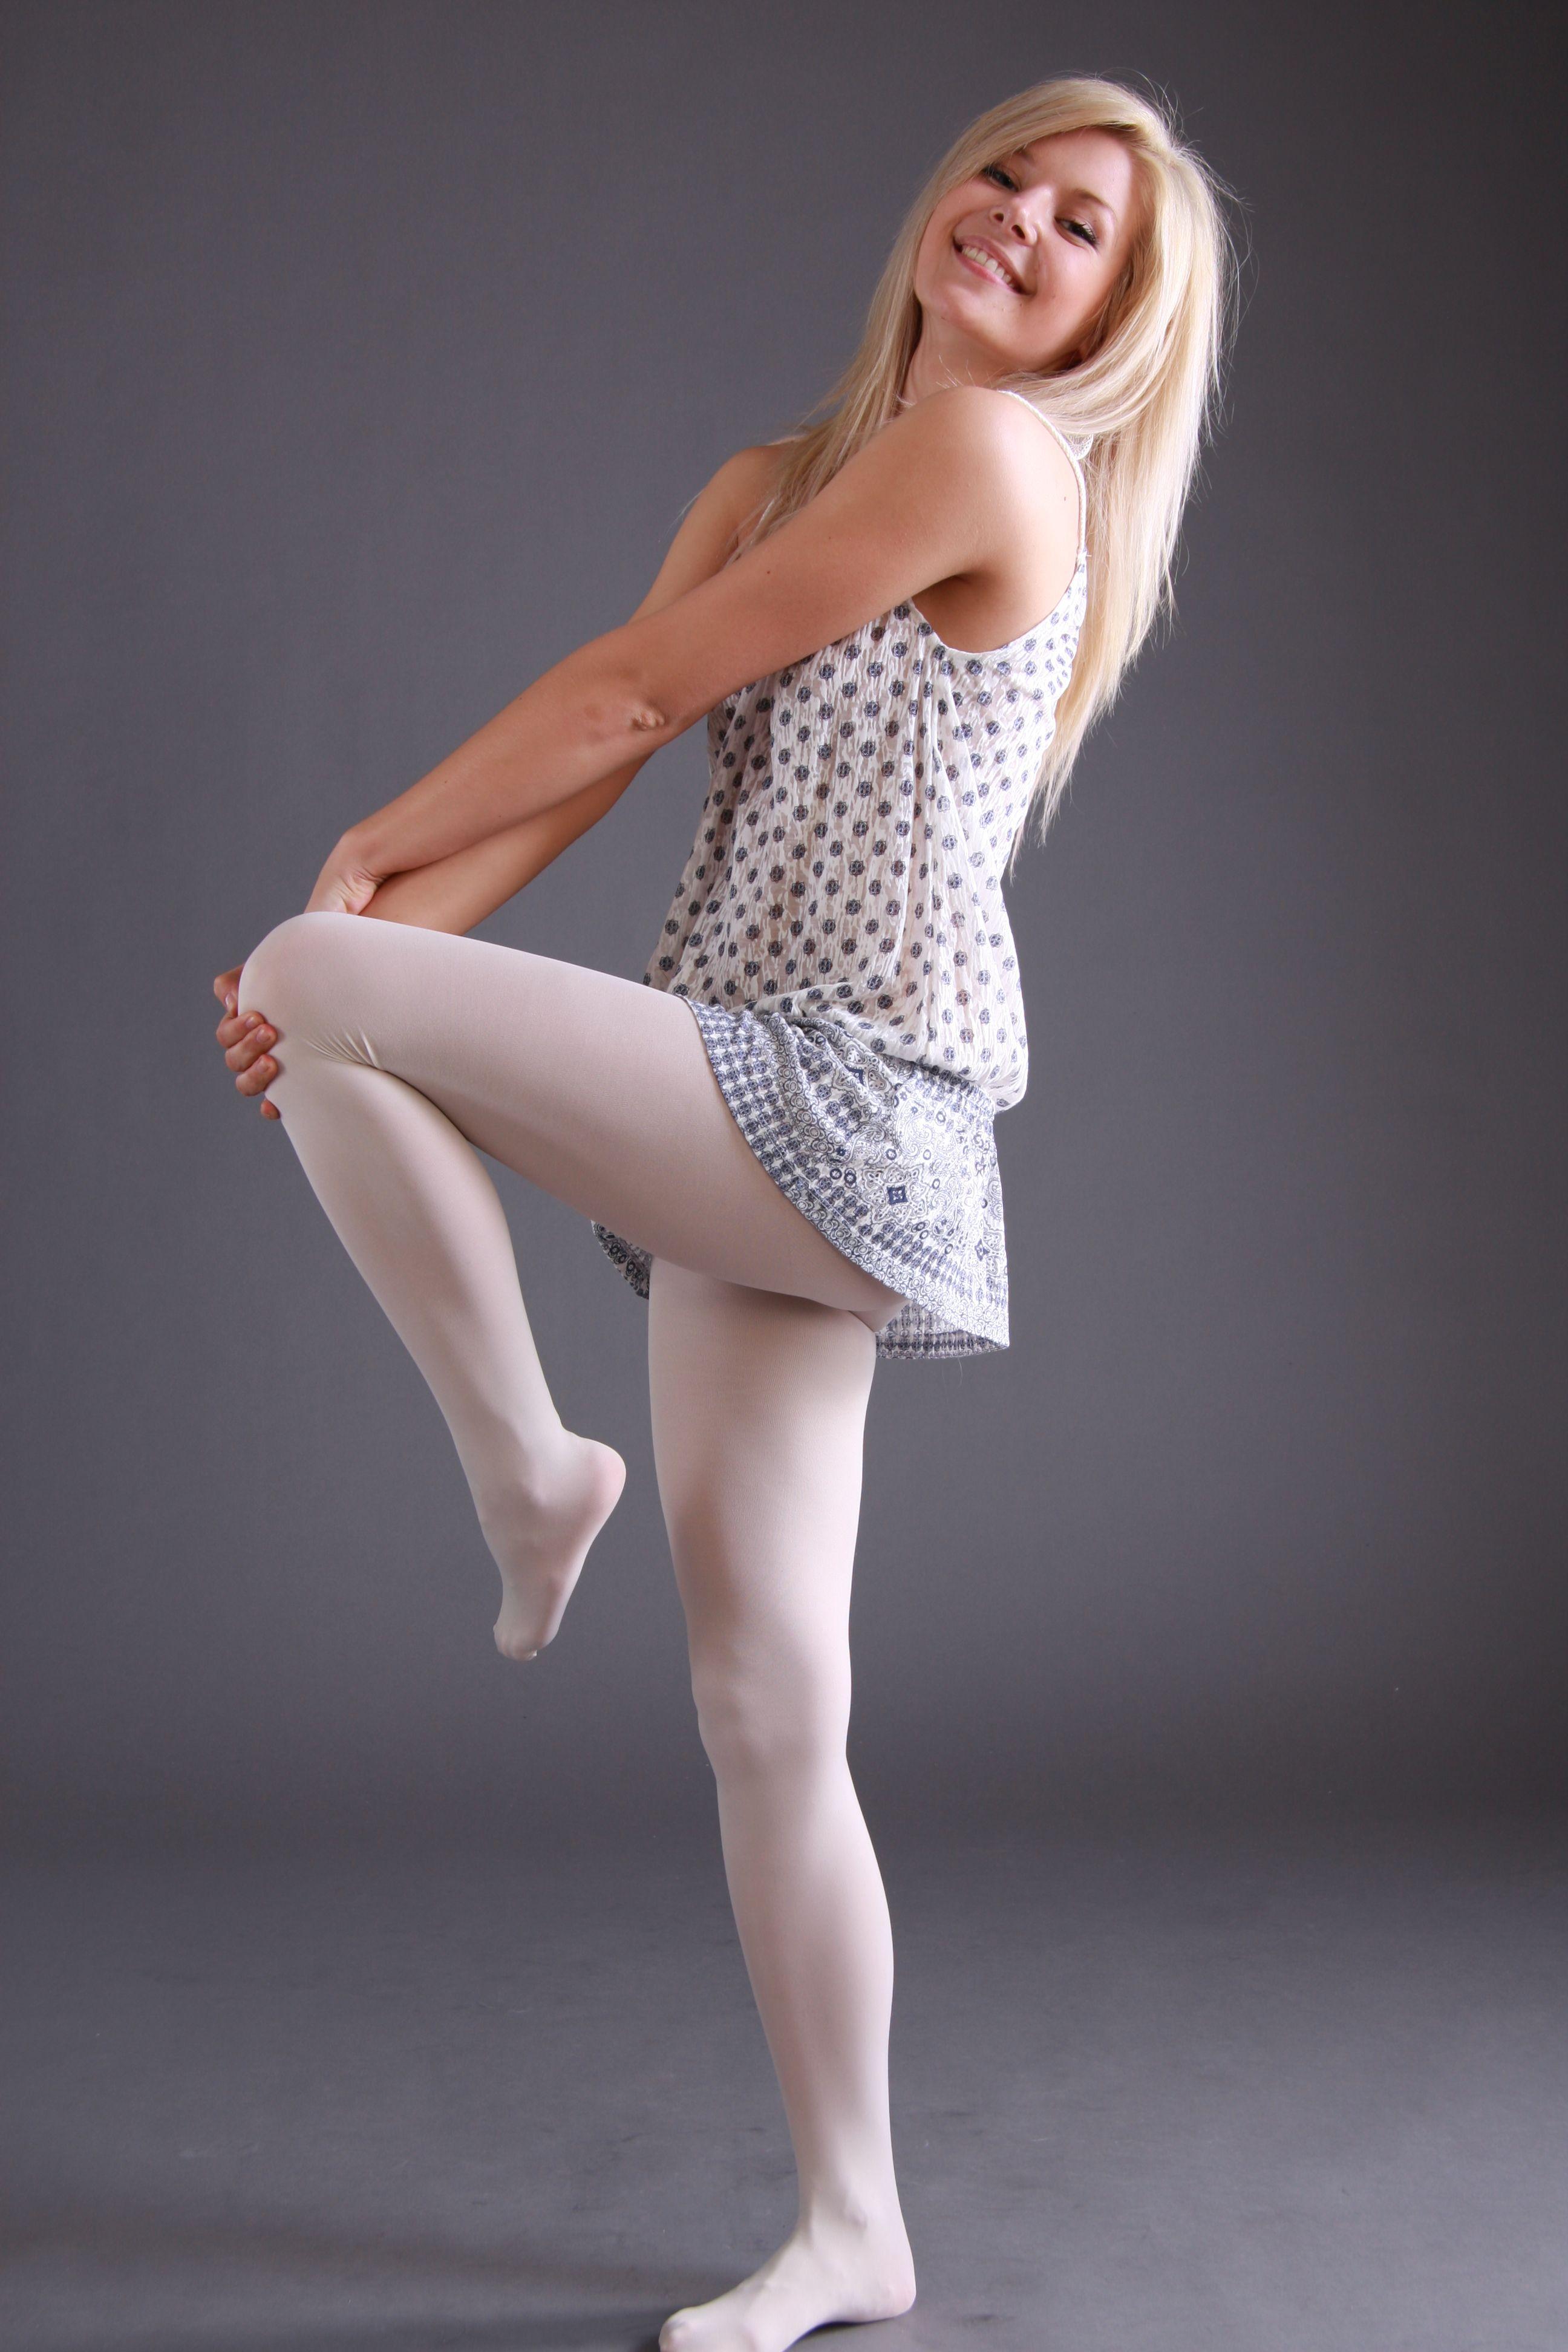 best of Fashion models Pantyhose